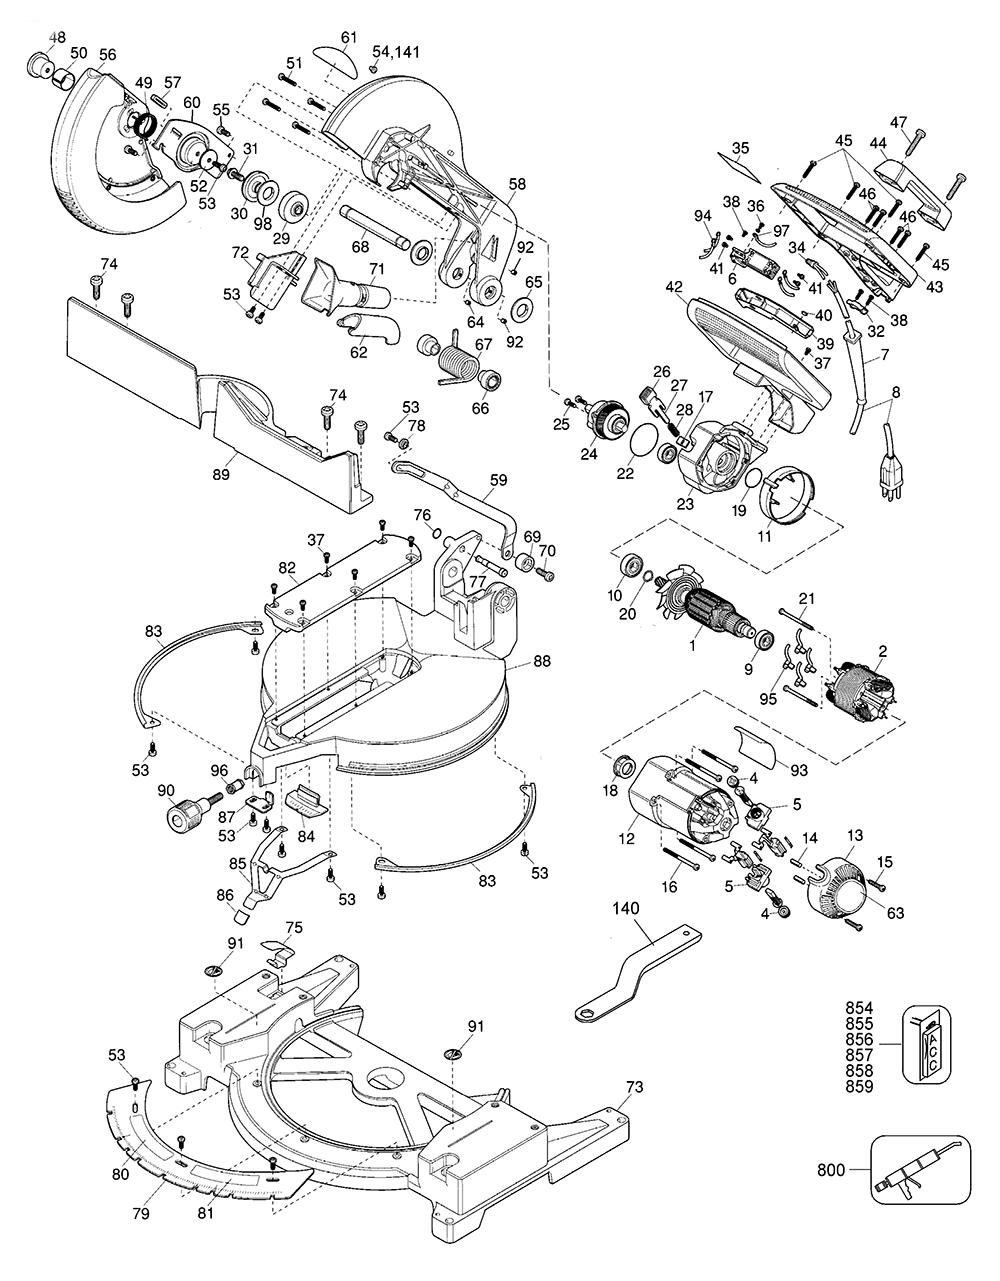 dewalt miter saw wiring diagram dw715 wiring diagram